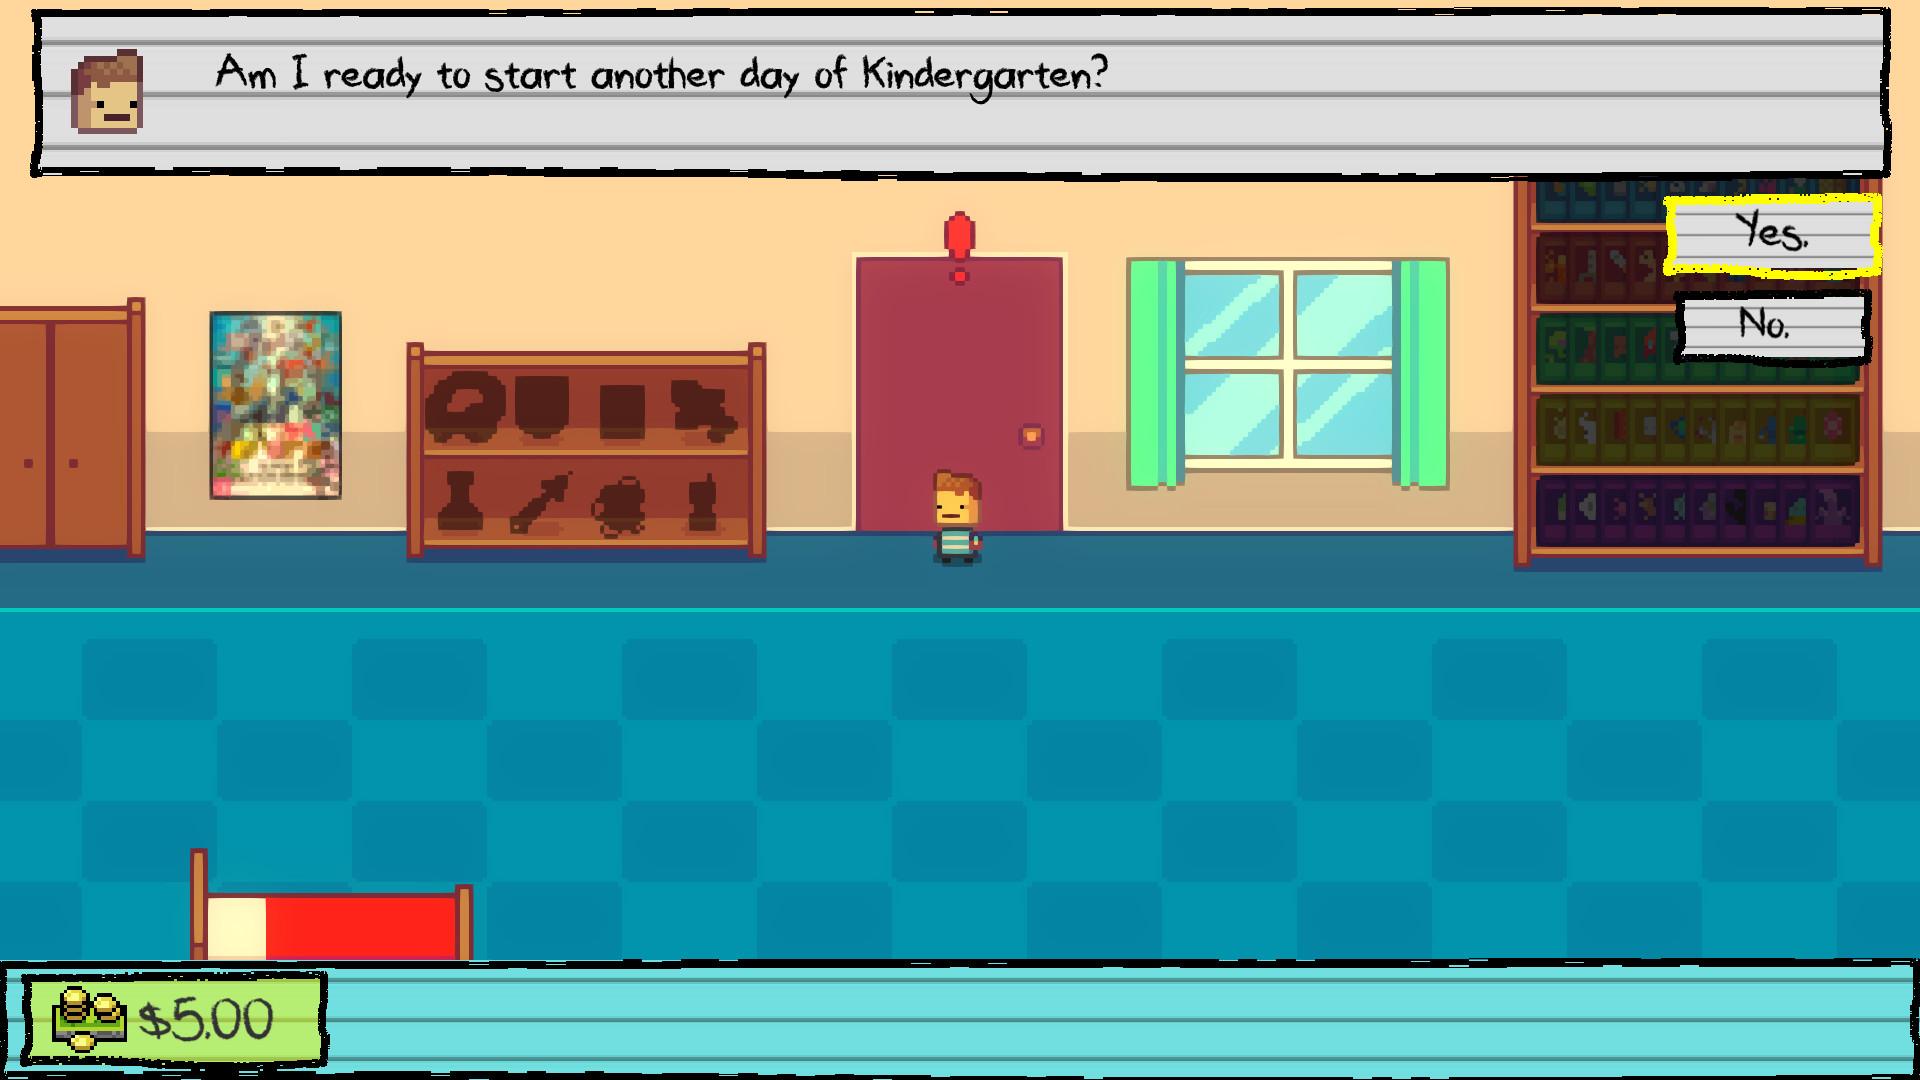 Kindergarten 2 Mac 破解版 黑暗风格动作游戏